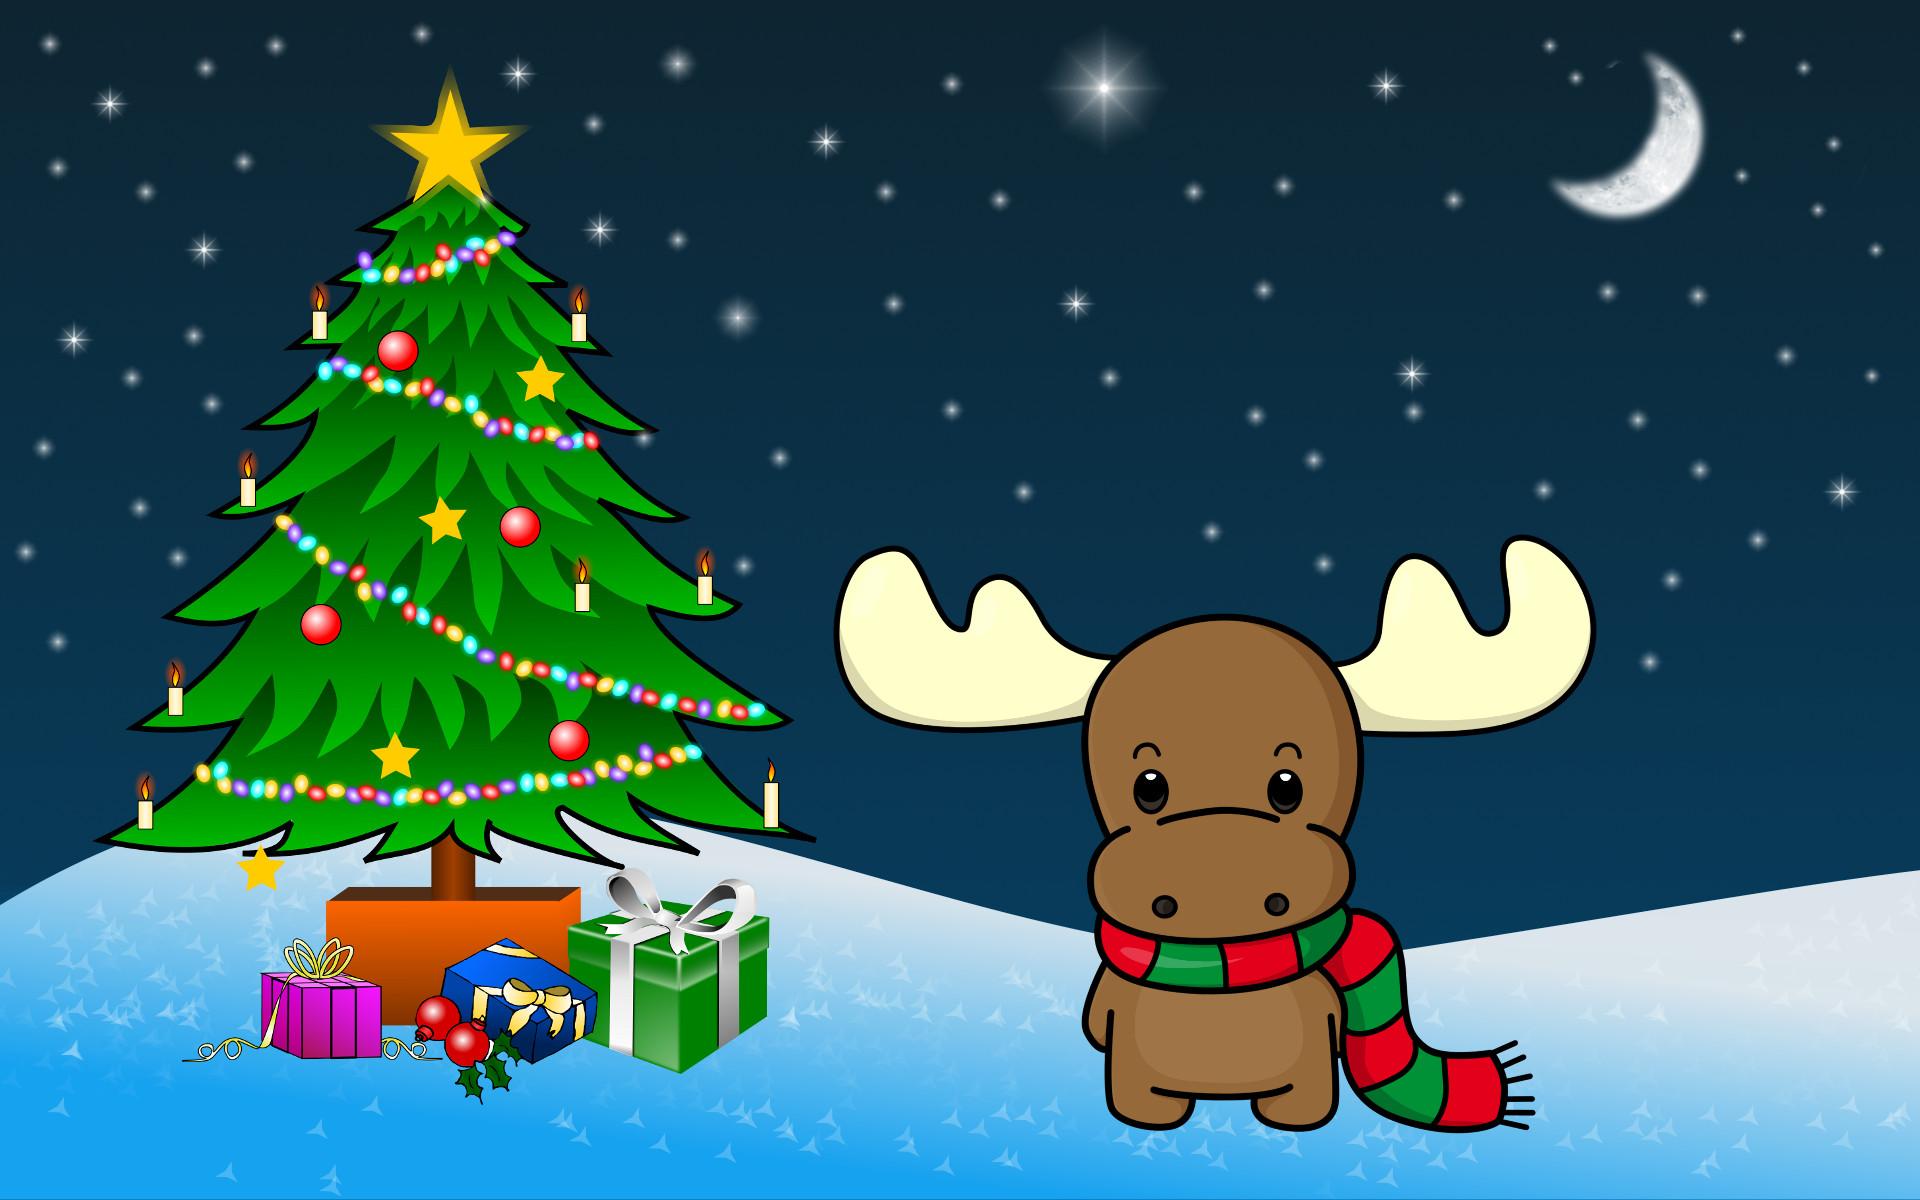 Shy Christmas Moose wallpaper